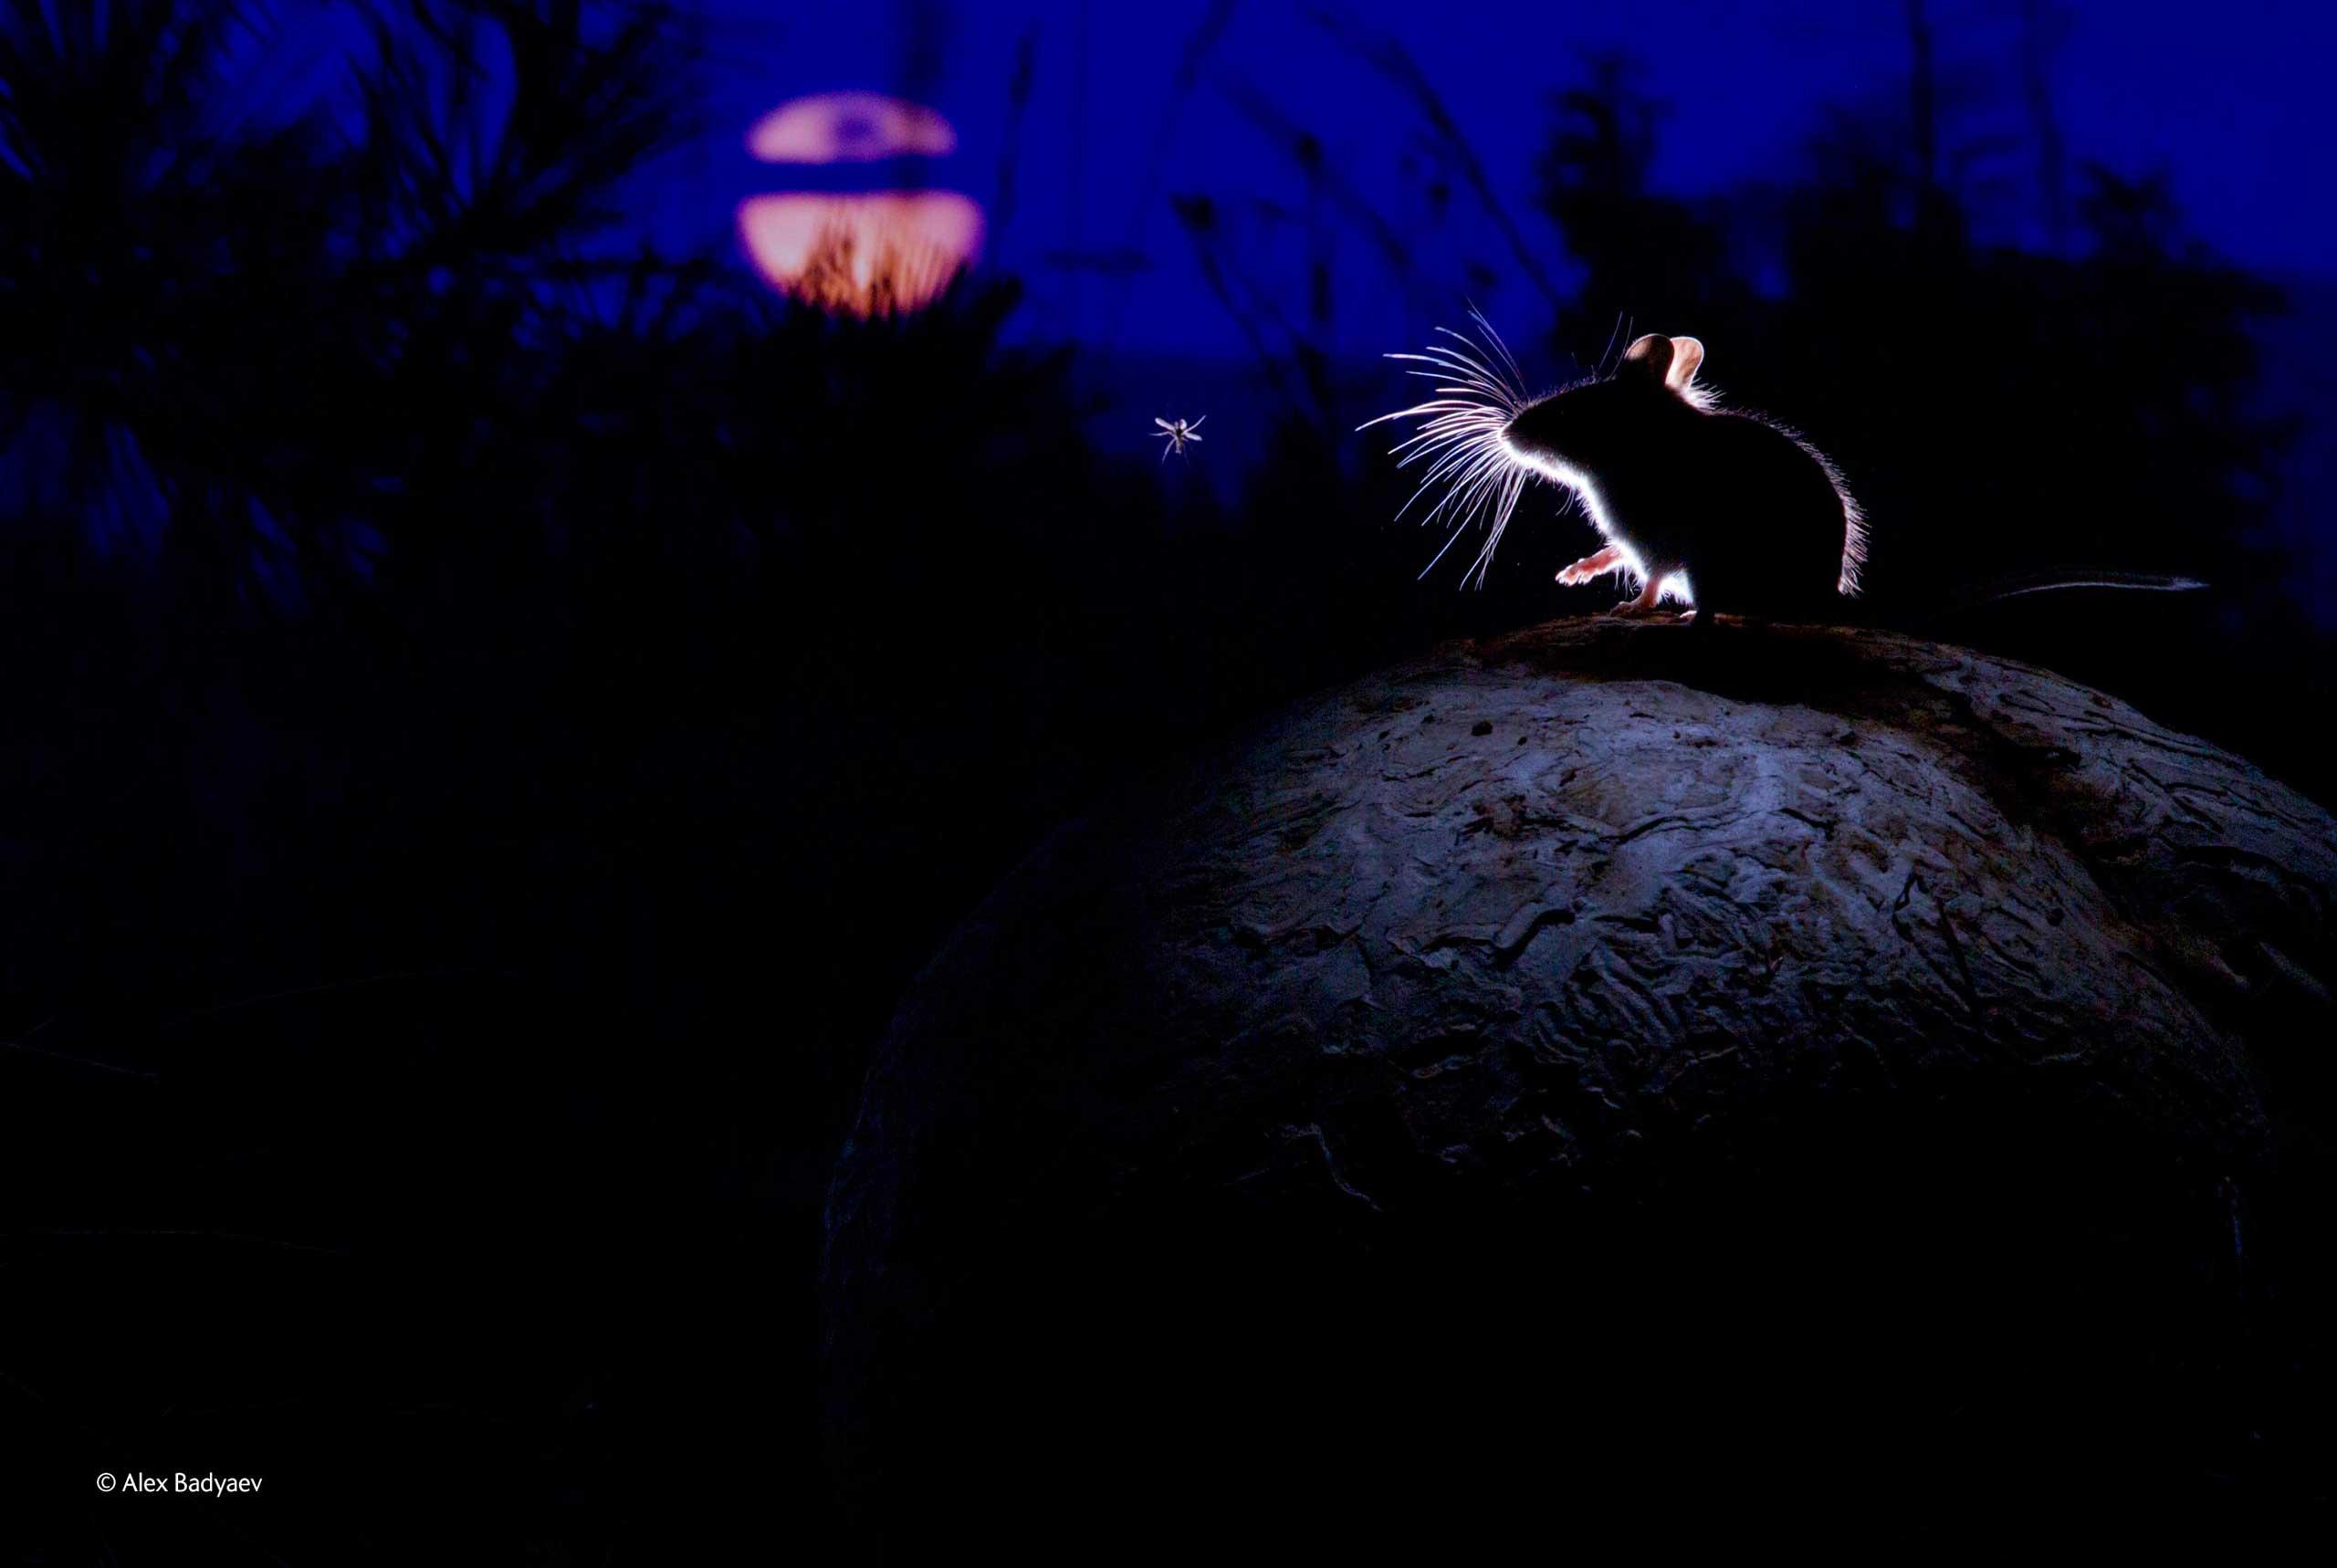 badyaev-contro luce-fotografia-naturalistica